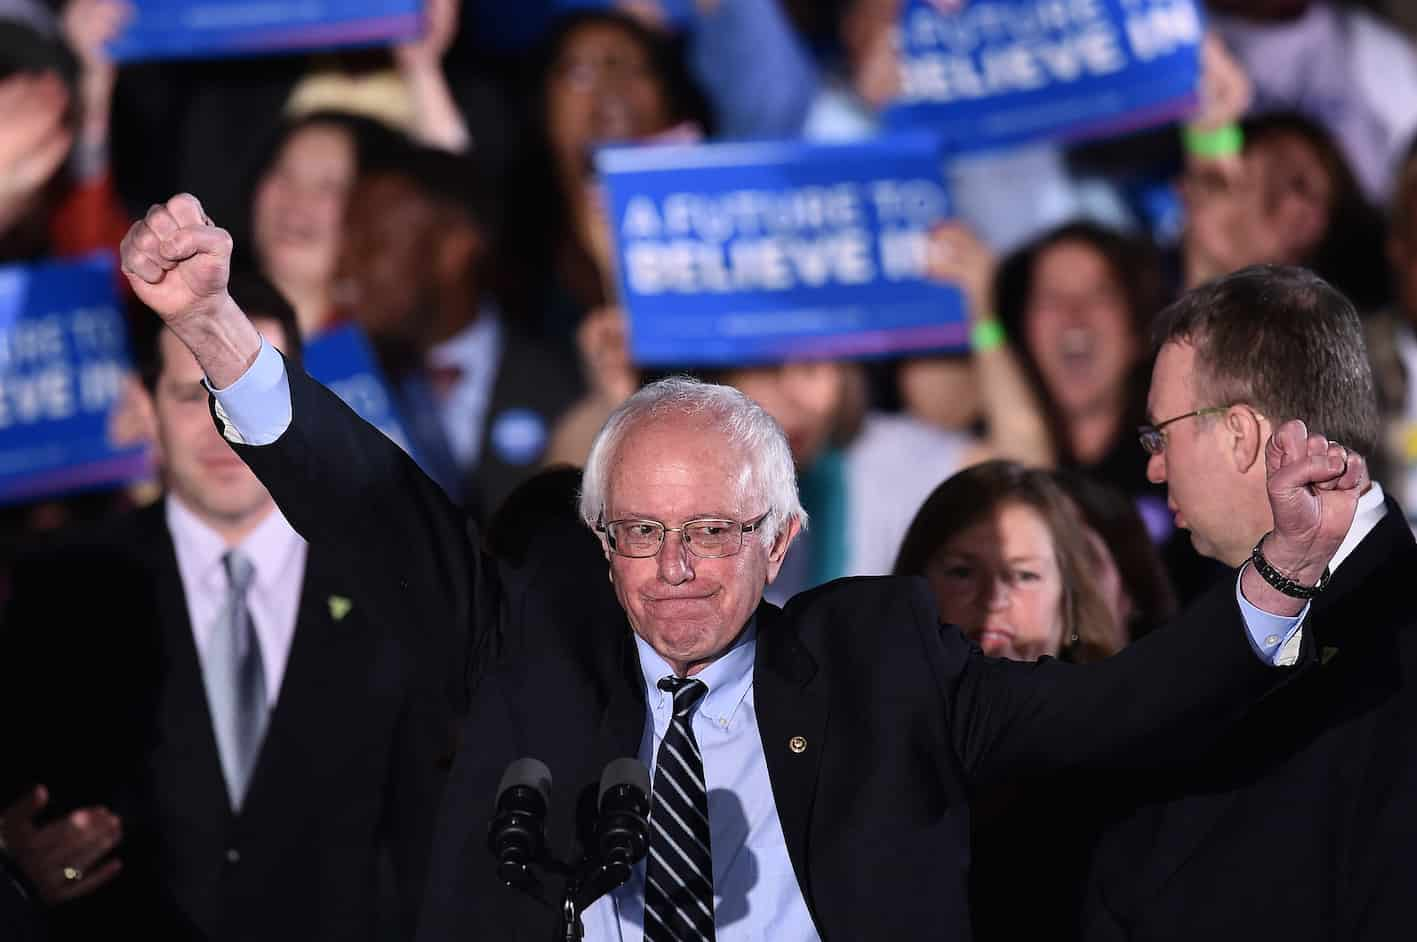 New Hampshire primaries: Bernie Sanders